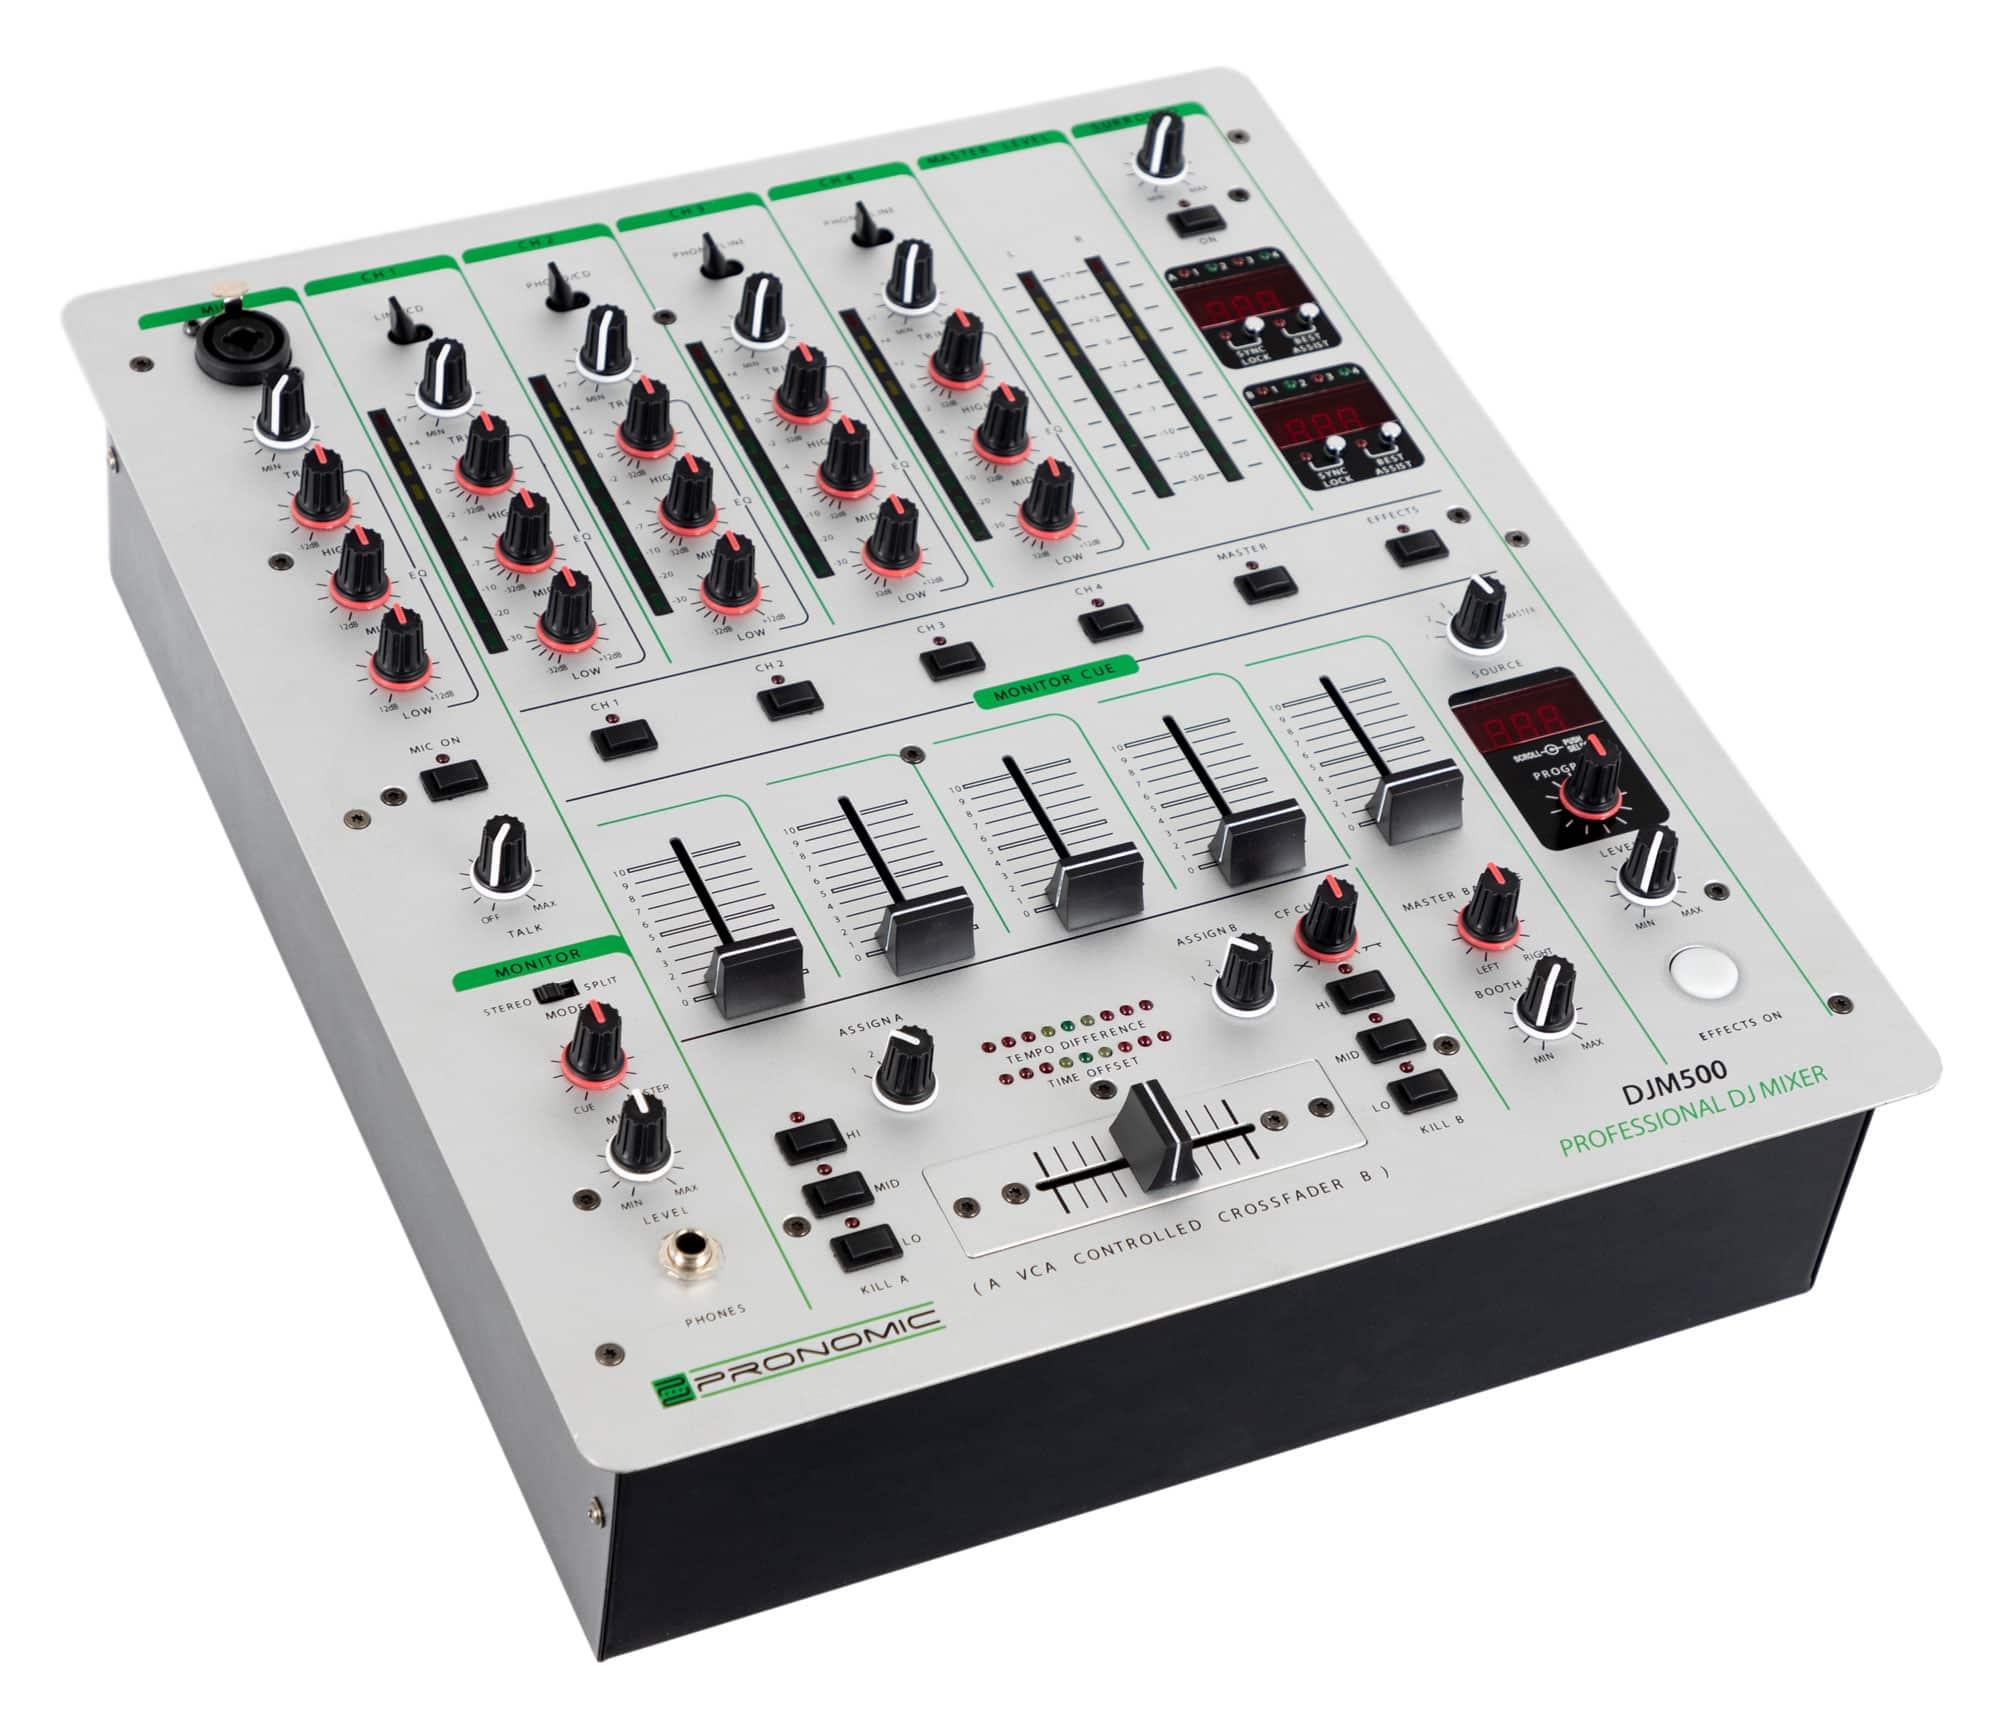 Djmixer - Pronomic DJM500 5 Kanal DJ Mixer - Onlineshop Musikhaus Kirstein